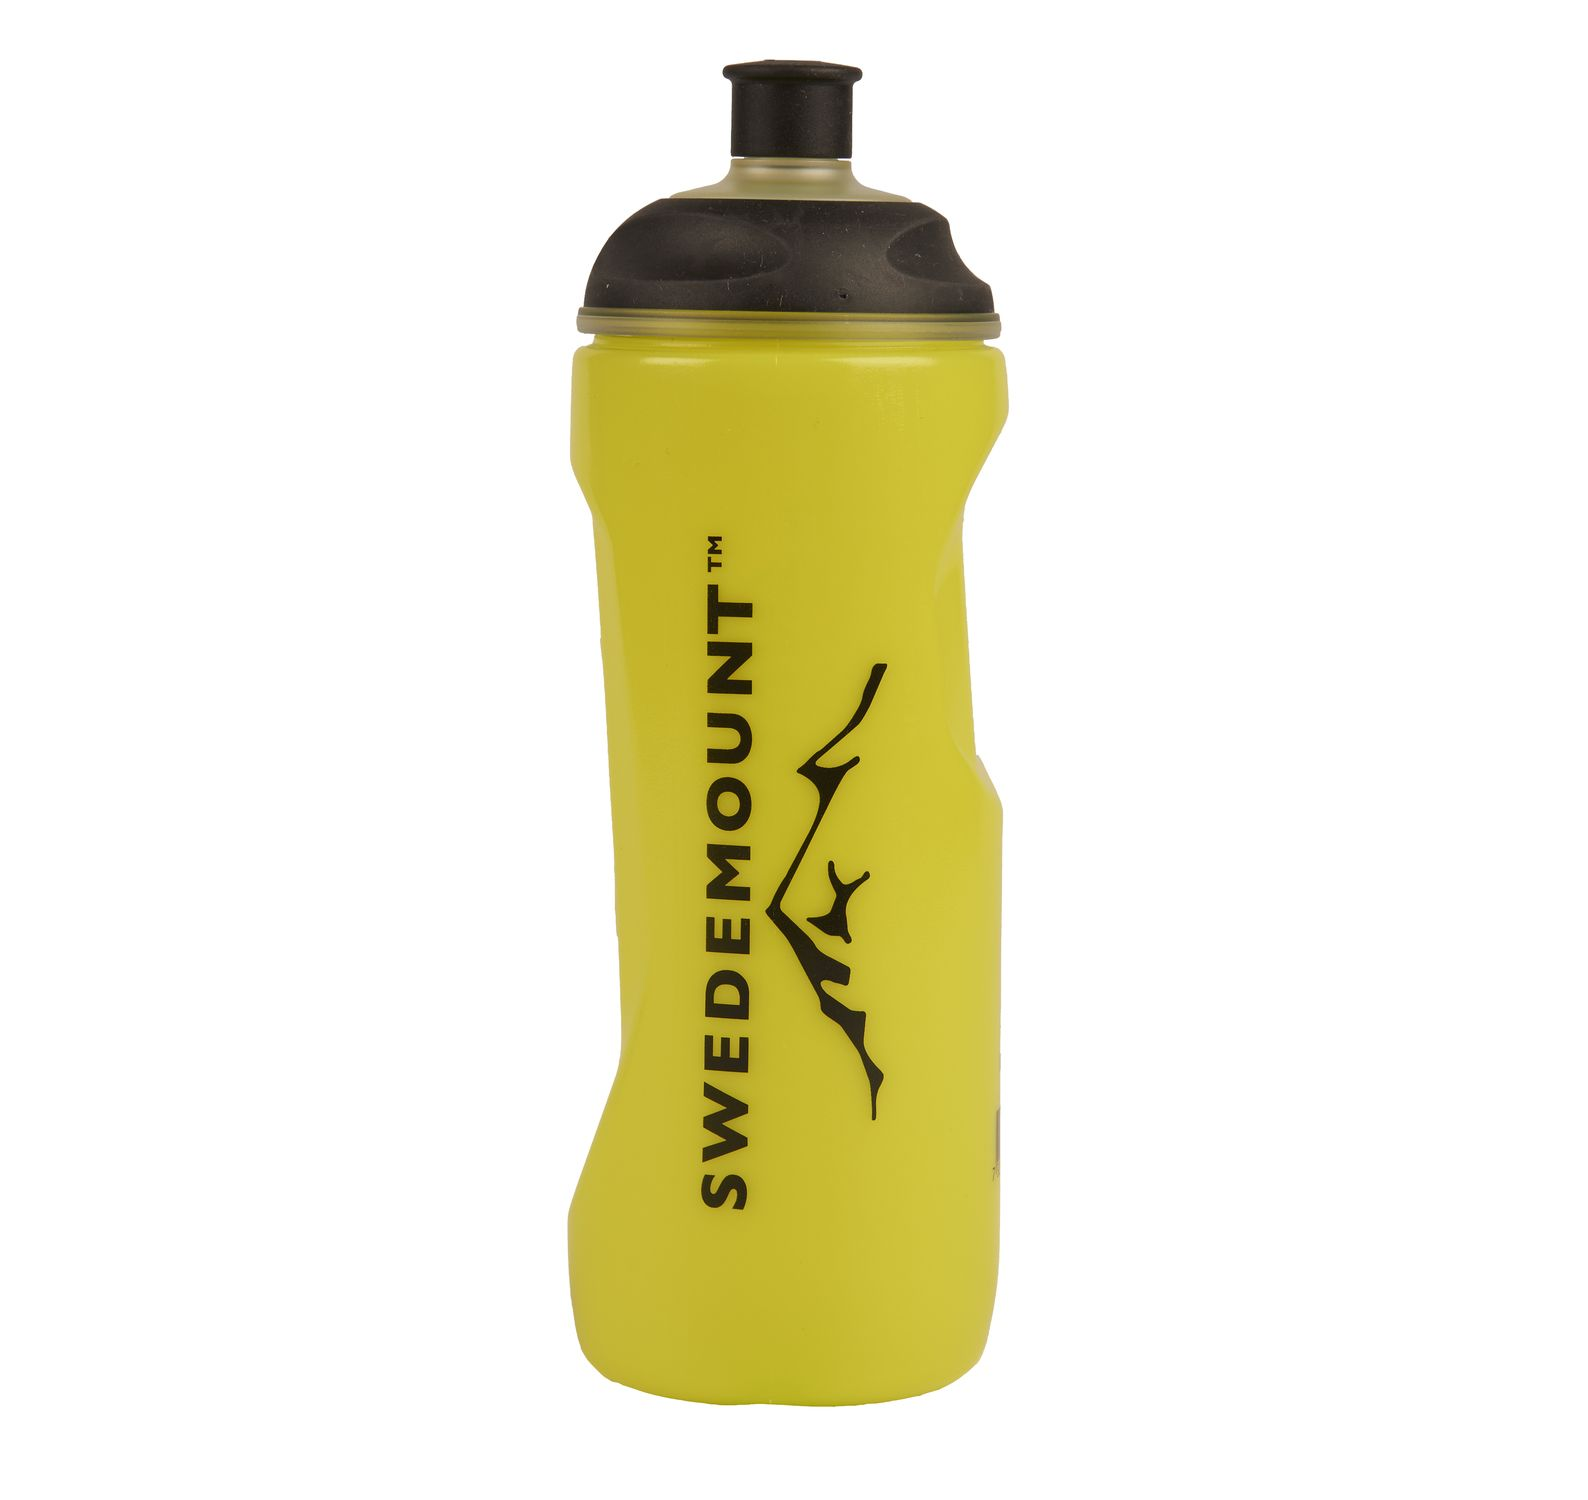 Swedemount Plastic Bottle, Lime, Onesize, Swedemount